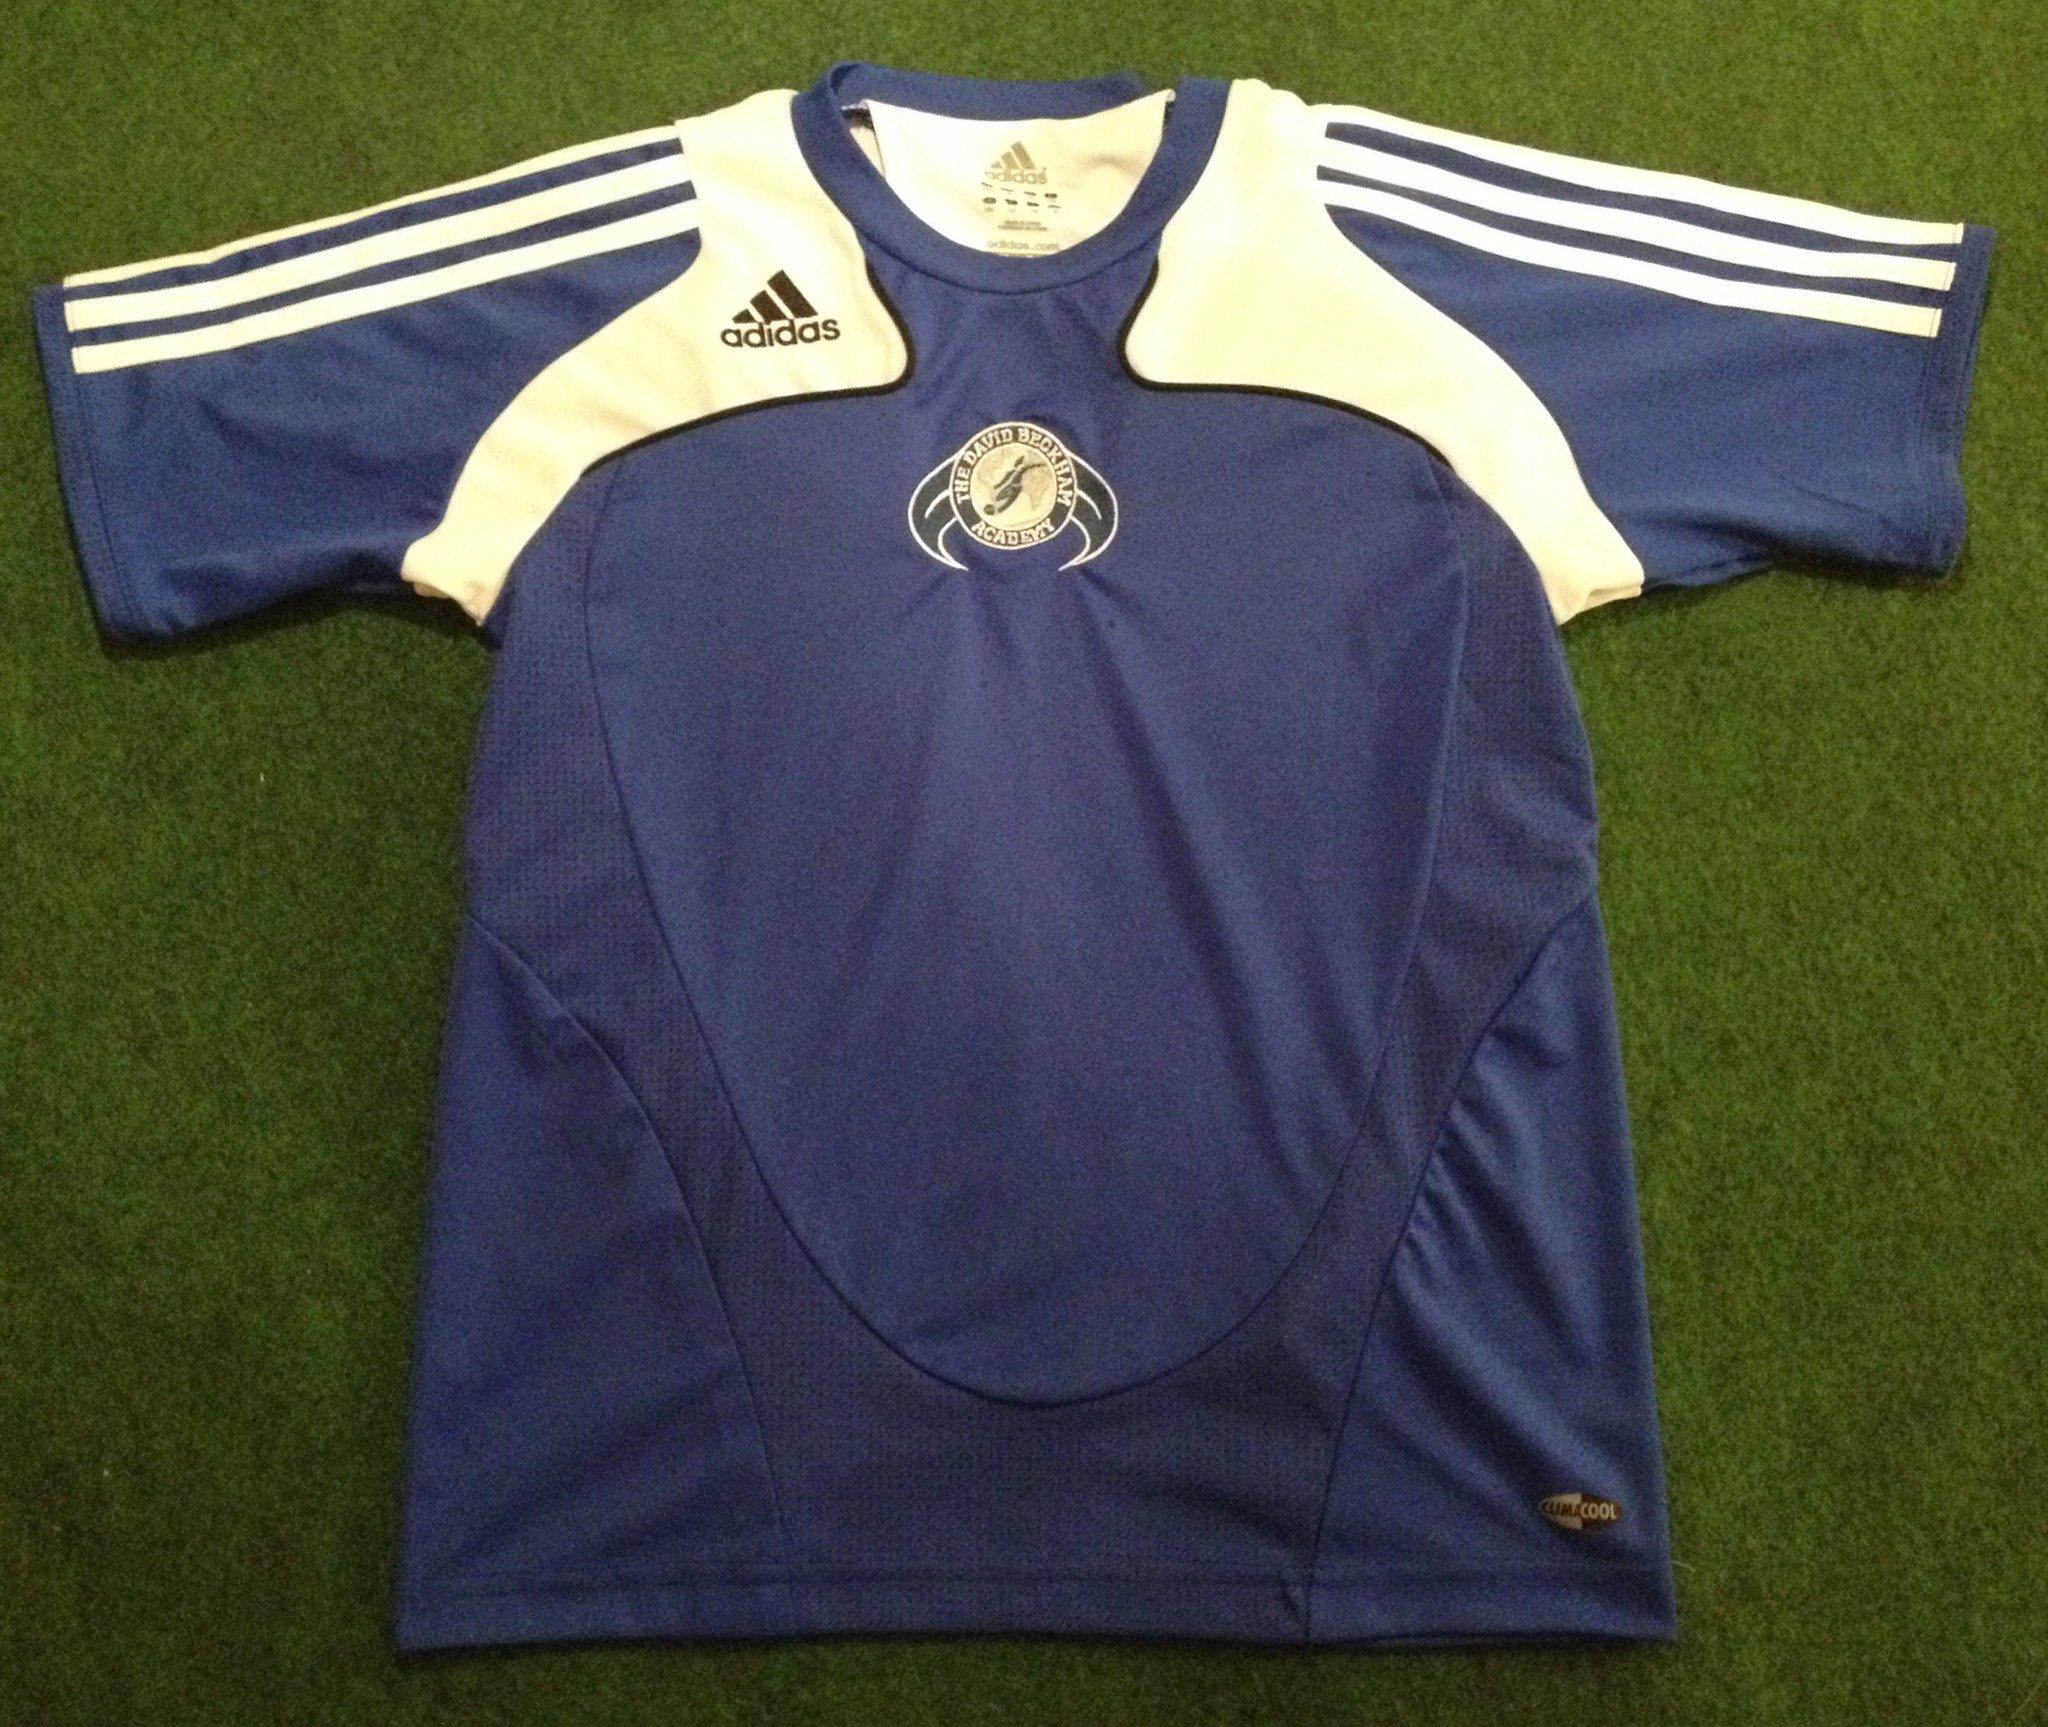 The David Beckham Academy Football Shirt (Medium Boys) by @The Kitman - https://t.co/fKcopbY3qB https://t.co/dkf4xnZxTJ